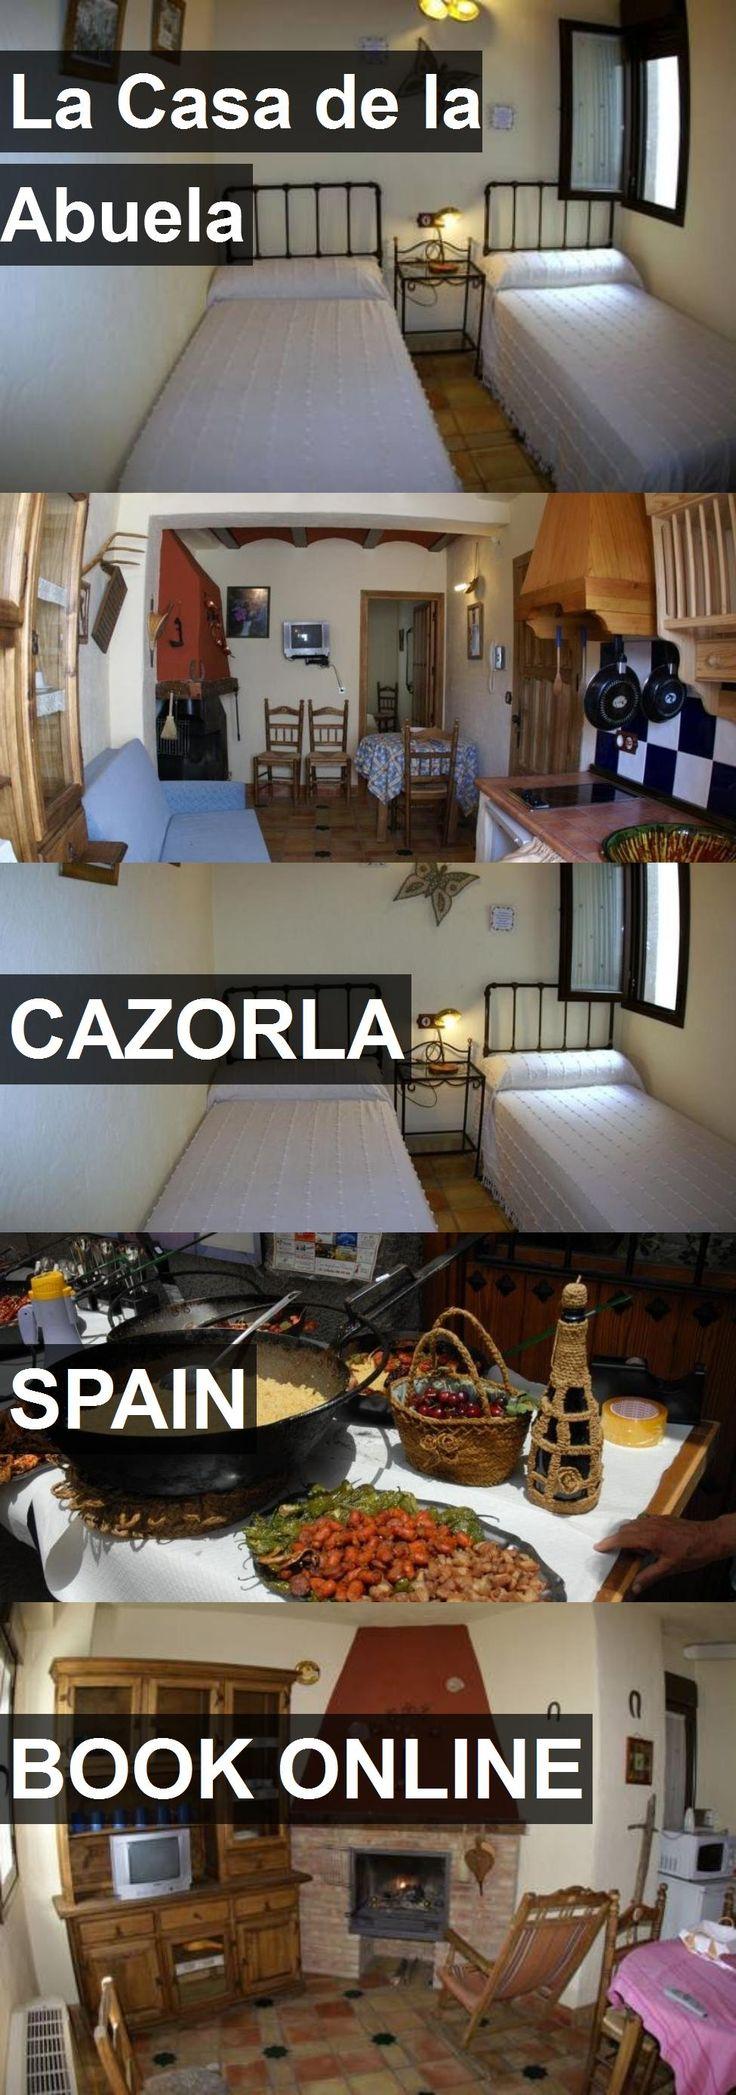 Hotel La Casa de la Abuela in Cazorla, Spain. For more information, photos, reviews and best prices please follow the link. #Spain #Cazorla #travel #vacation #hotel